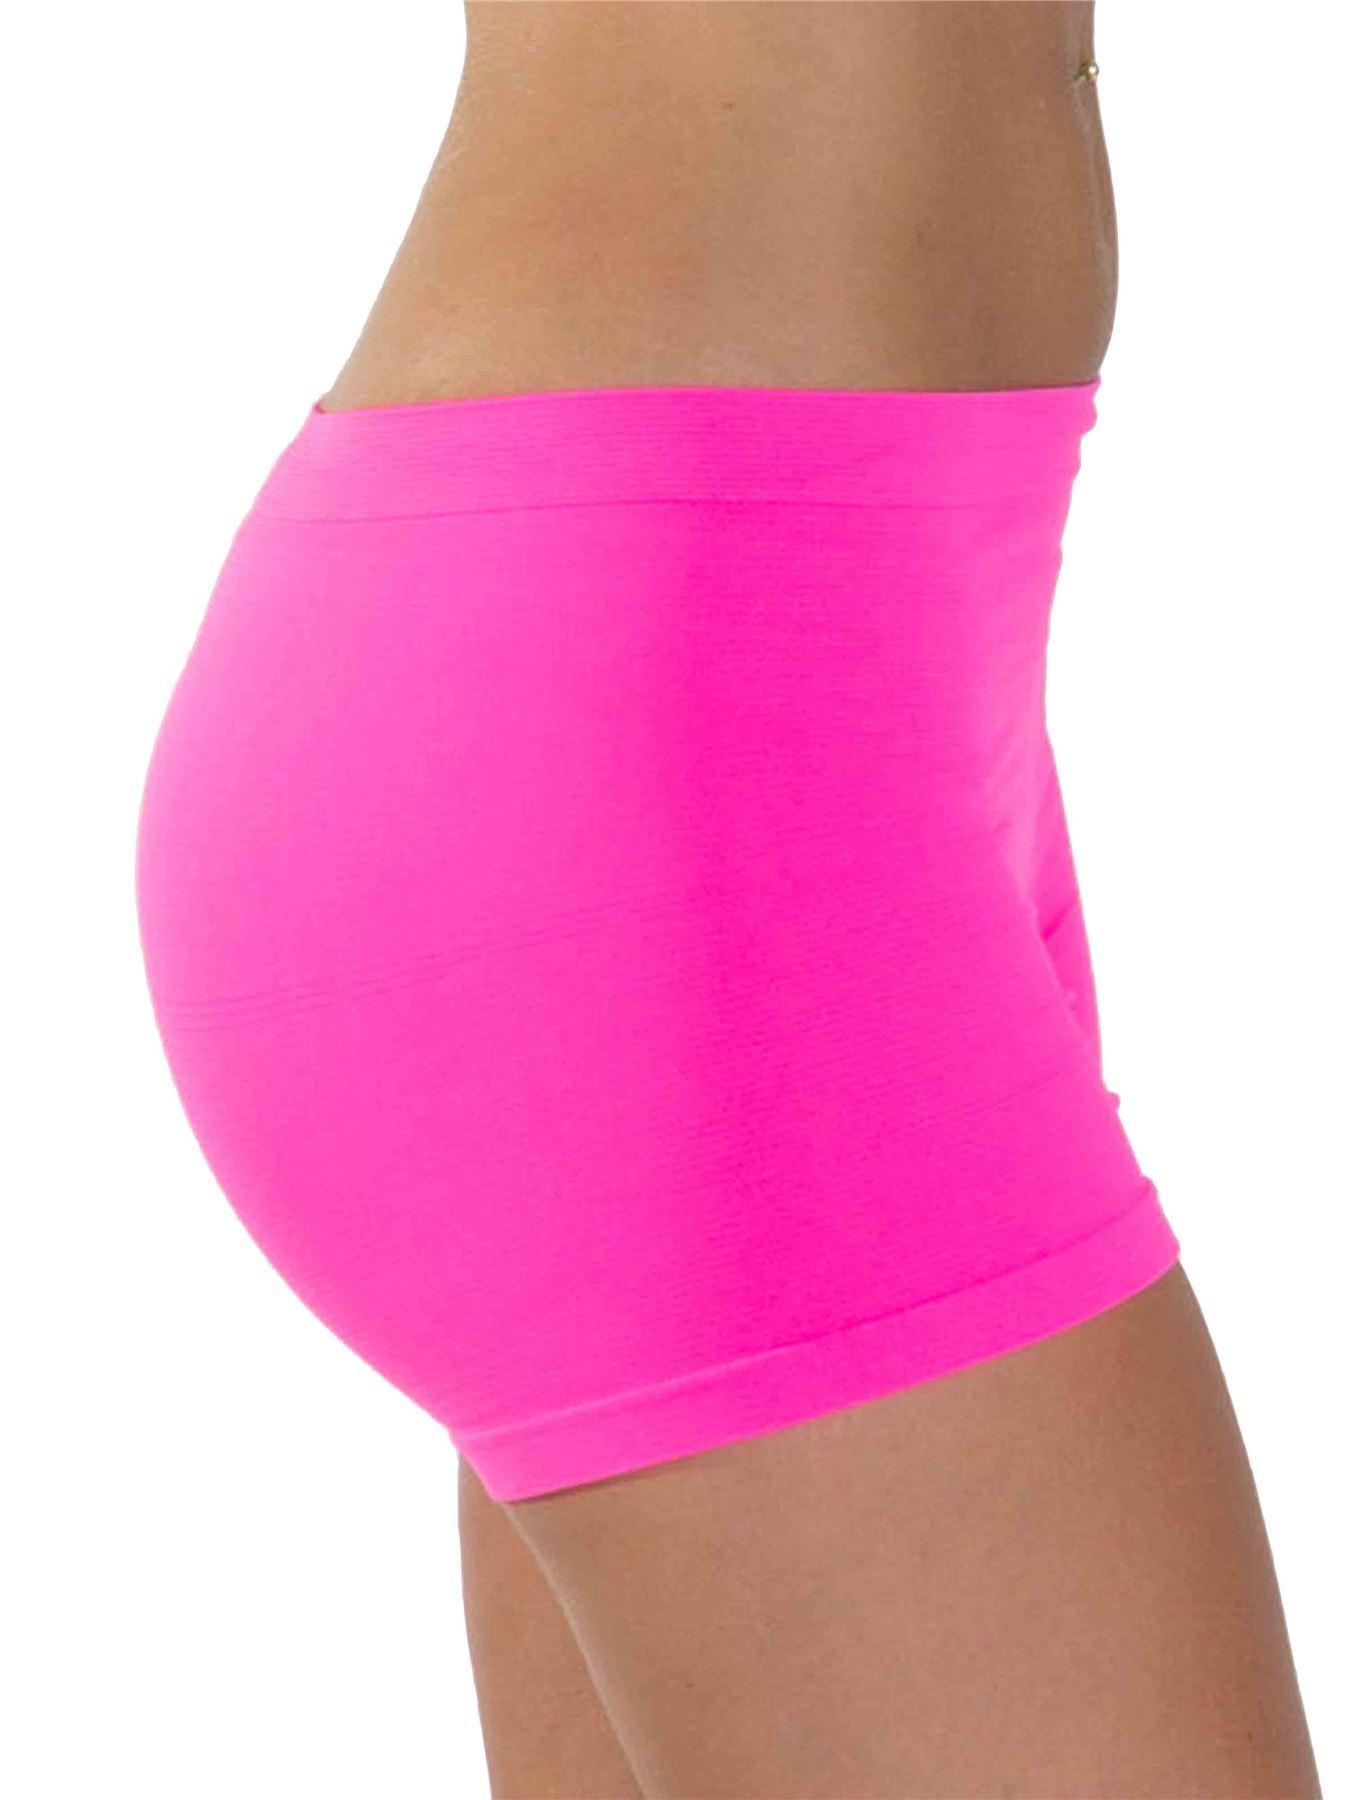 1dd48f8a16fb Womens Underwear Plain High Waist Seamless Stretch Ladies Boxer ...